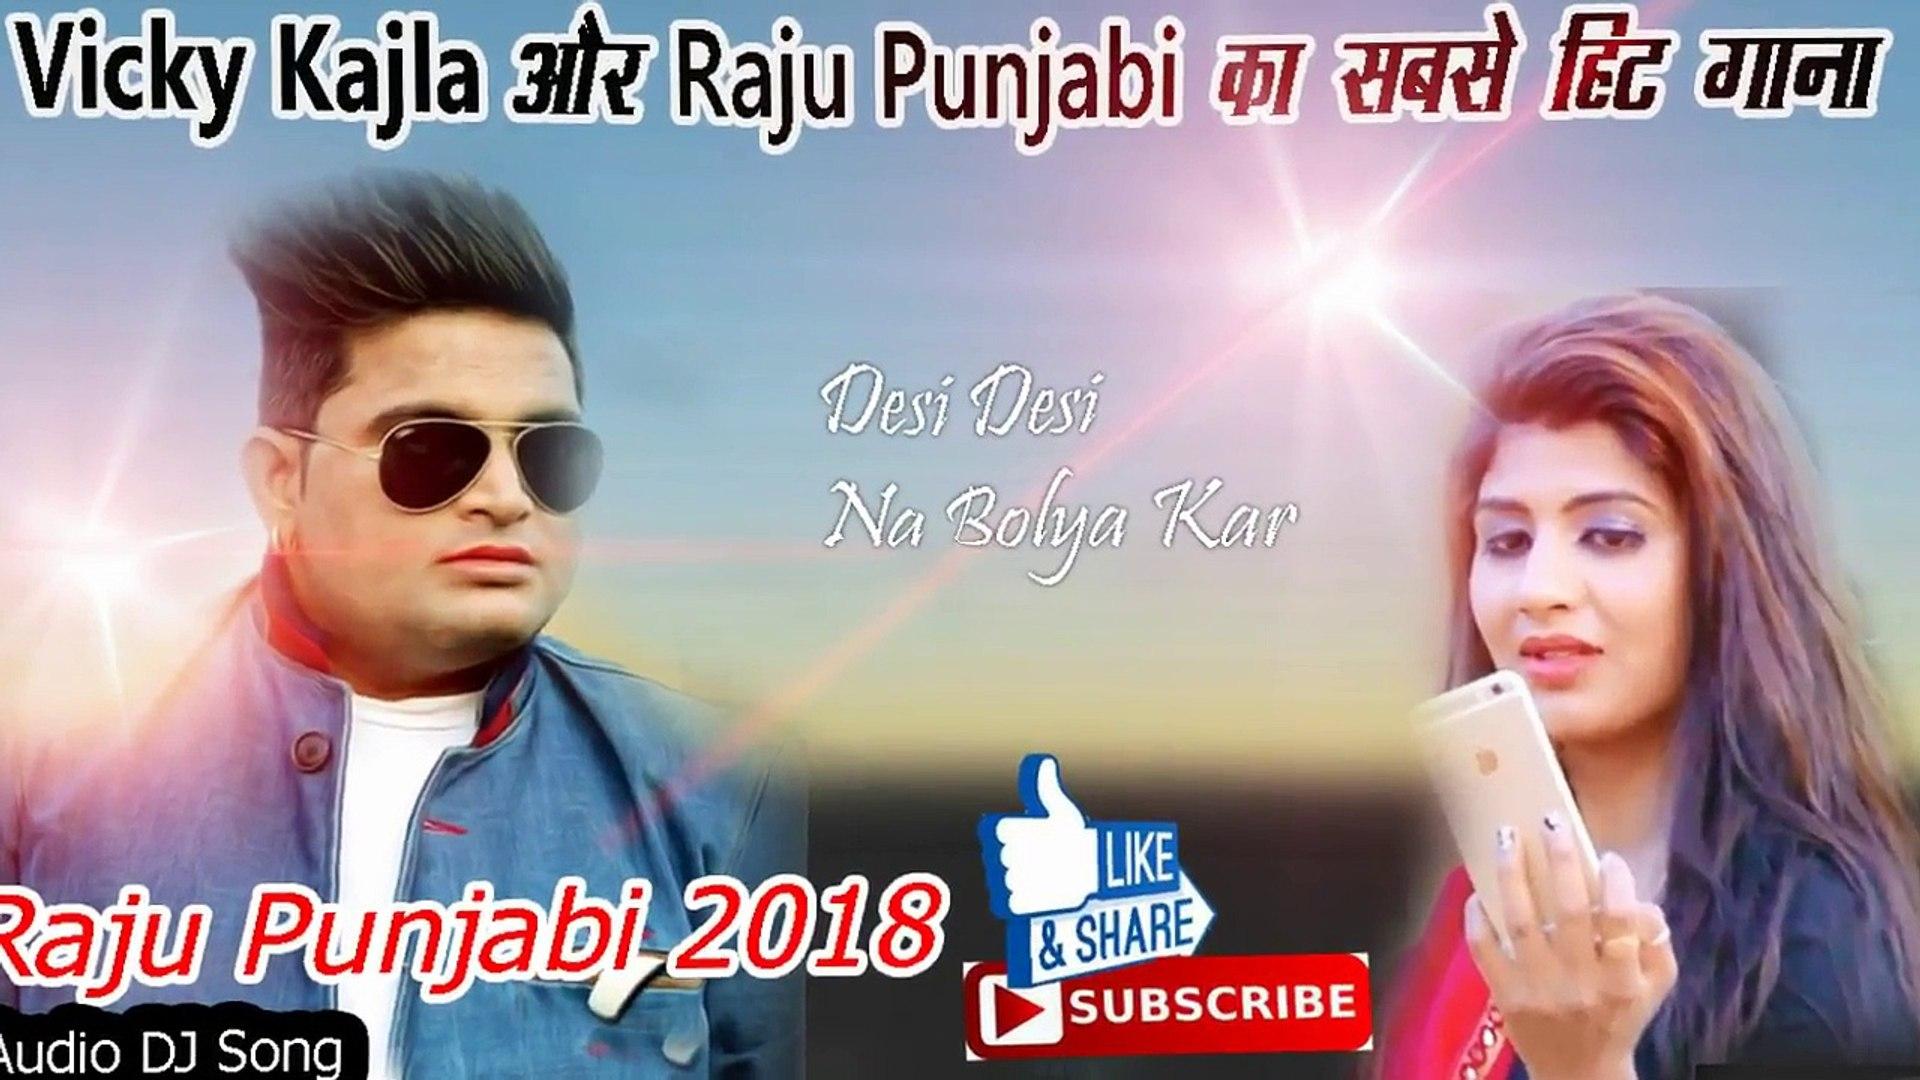 Raju Punjabi New Song ~ Haryana New DJ Song 2018 // Desi Desi Na Bolya Kar  DJ Remix